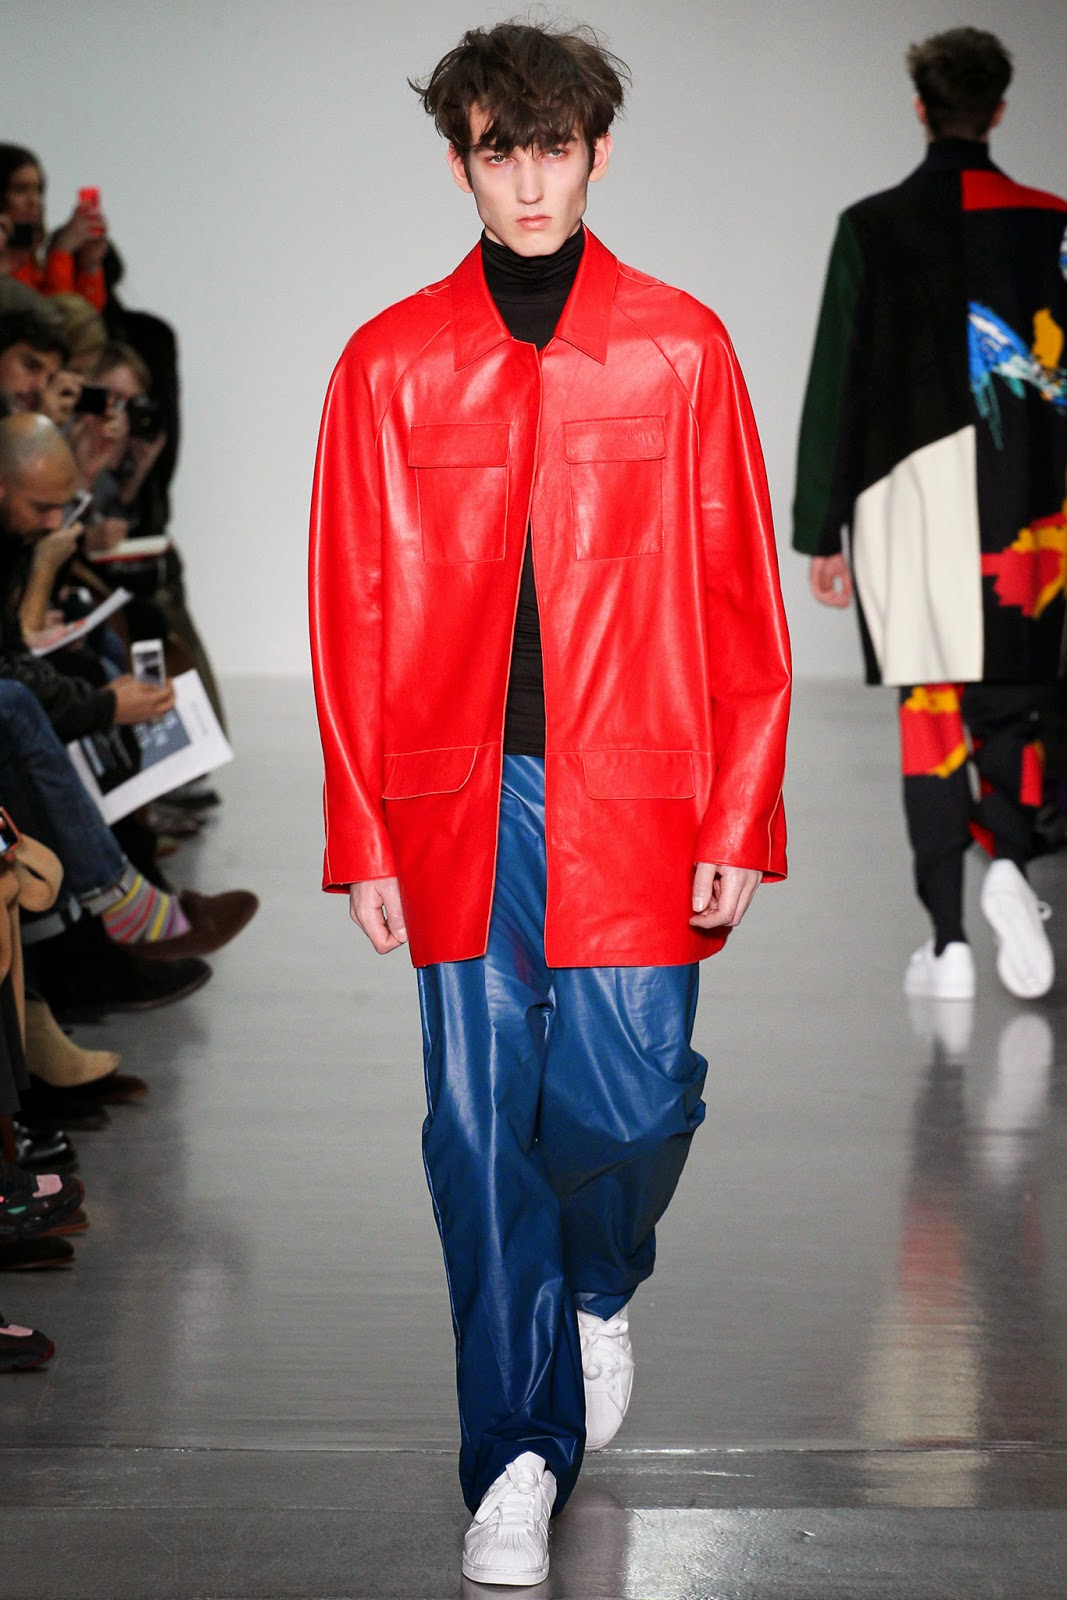 d9d0be08aaf1 Stylefluid Trendz  London Menswear Fashion Week  Agi and Sam Fall ...